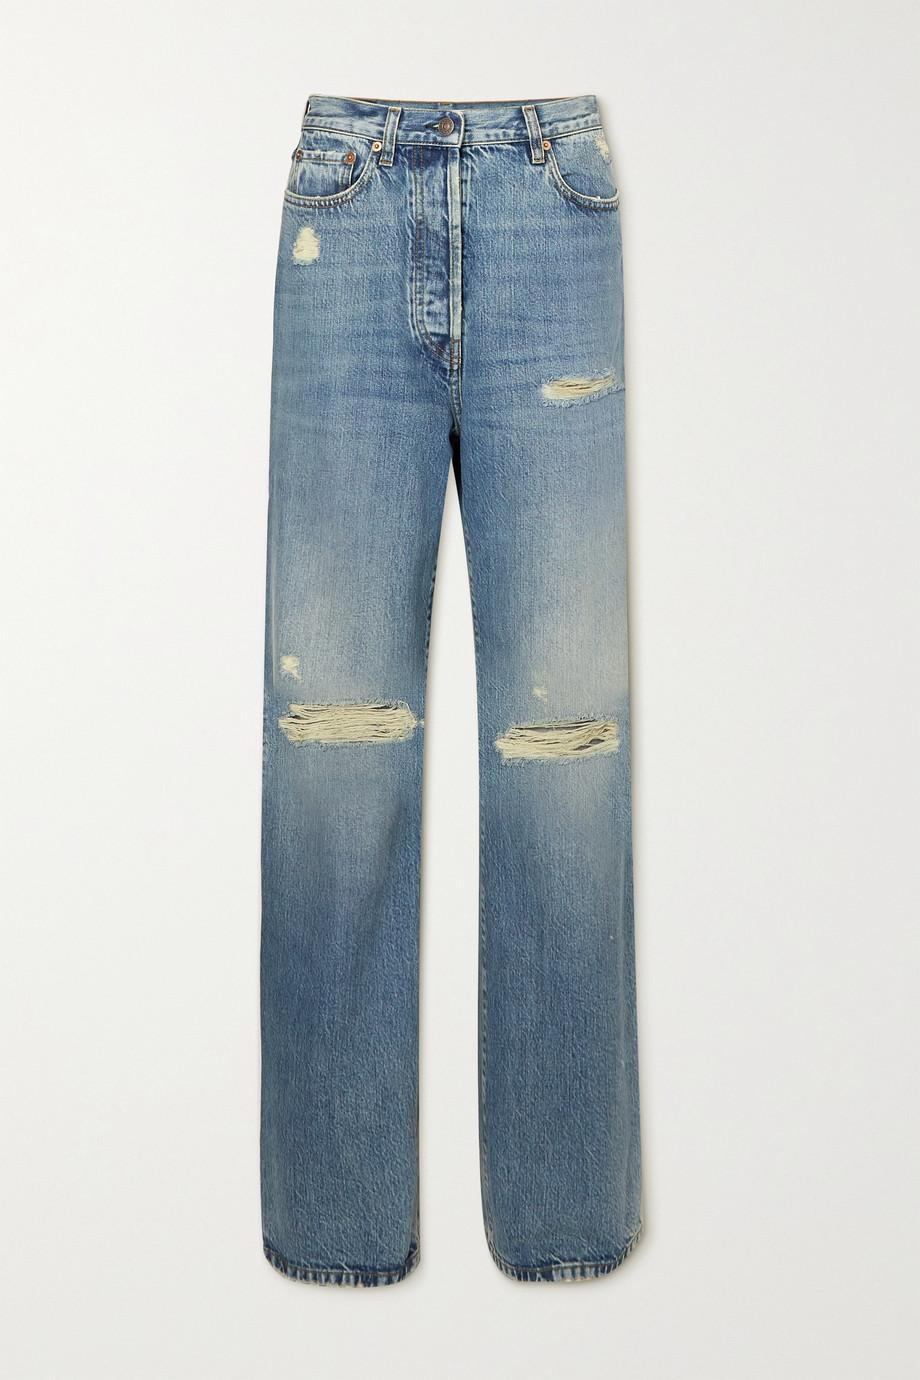 Gucci Distressed organic boyfriend jeans